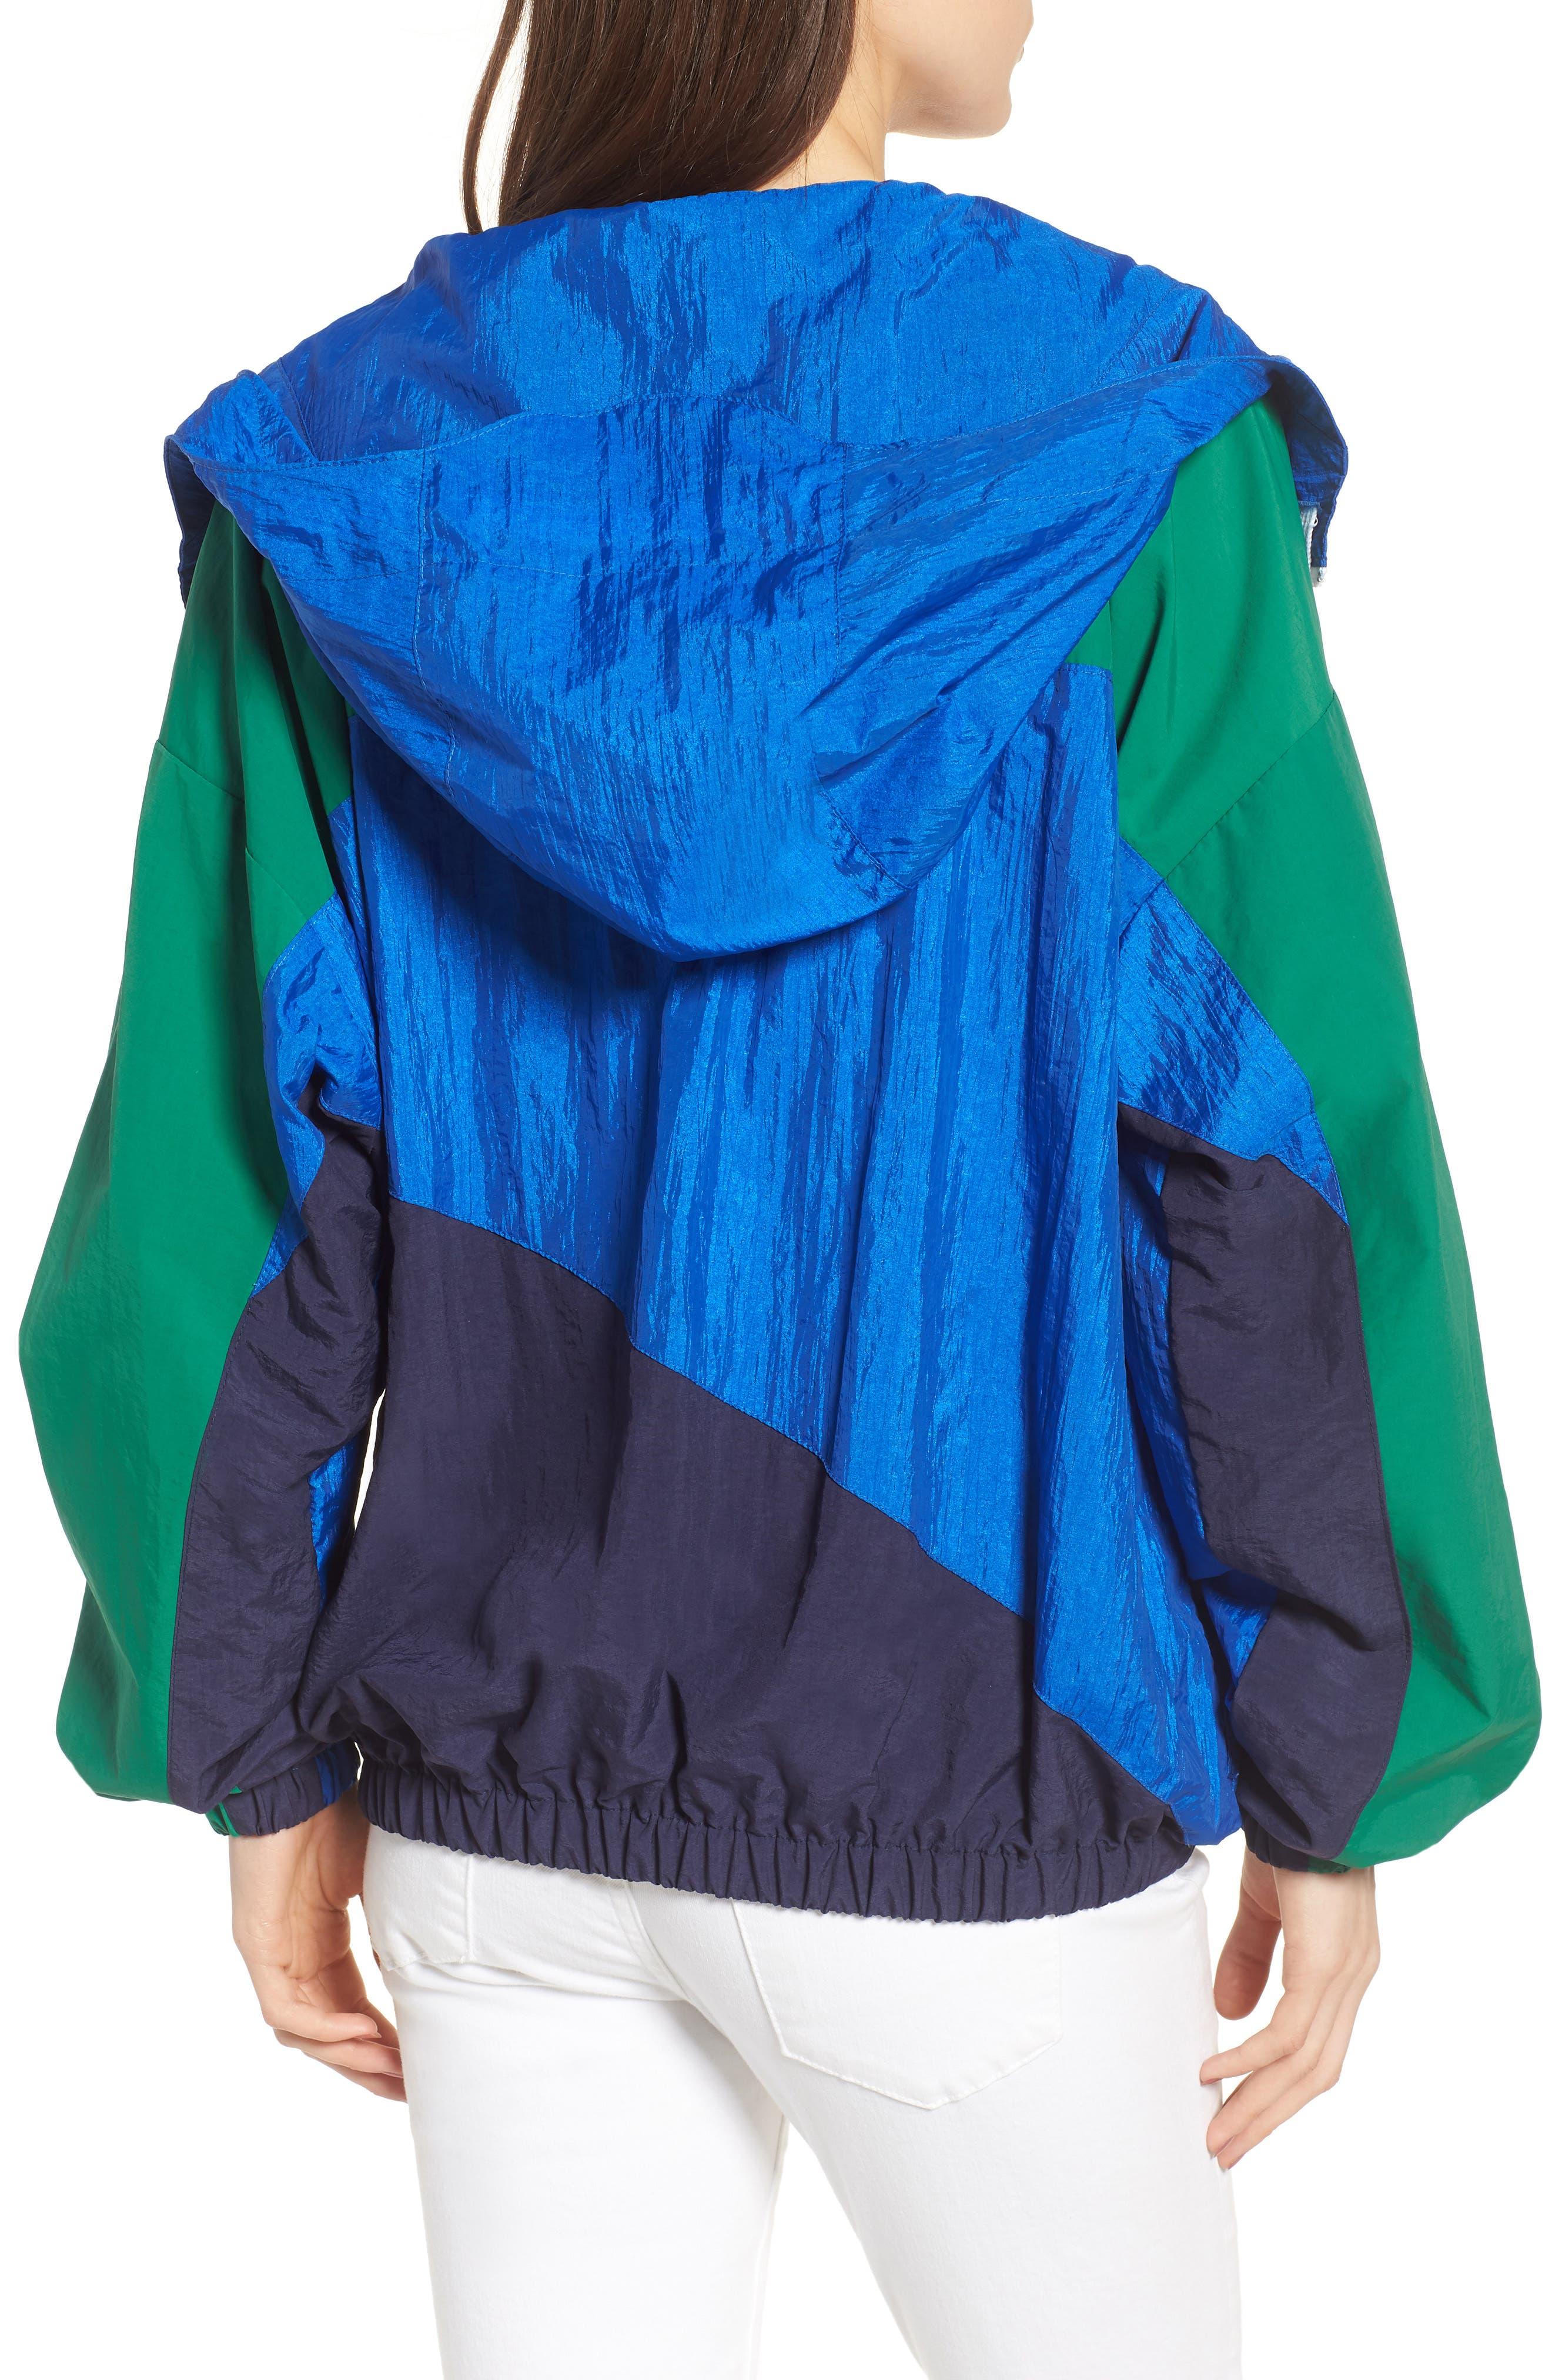 Colorblock Windbreaker Jacket,                             Alternate thumbnail 3, color,                             Green/ Blue